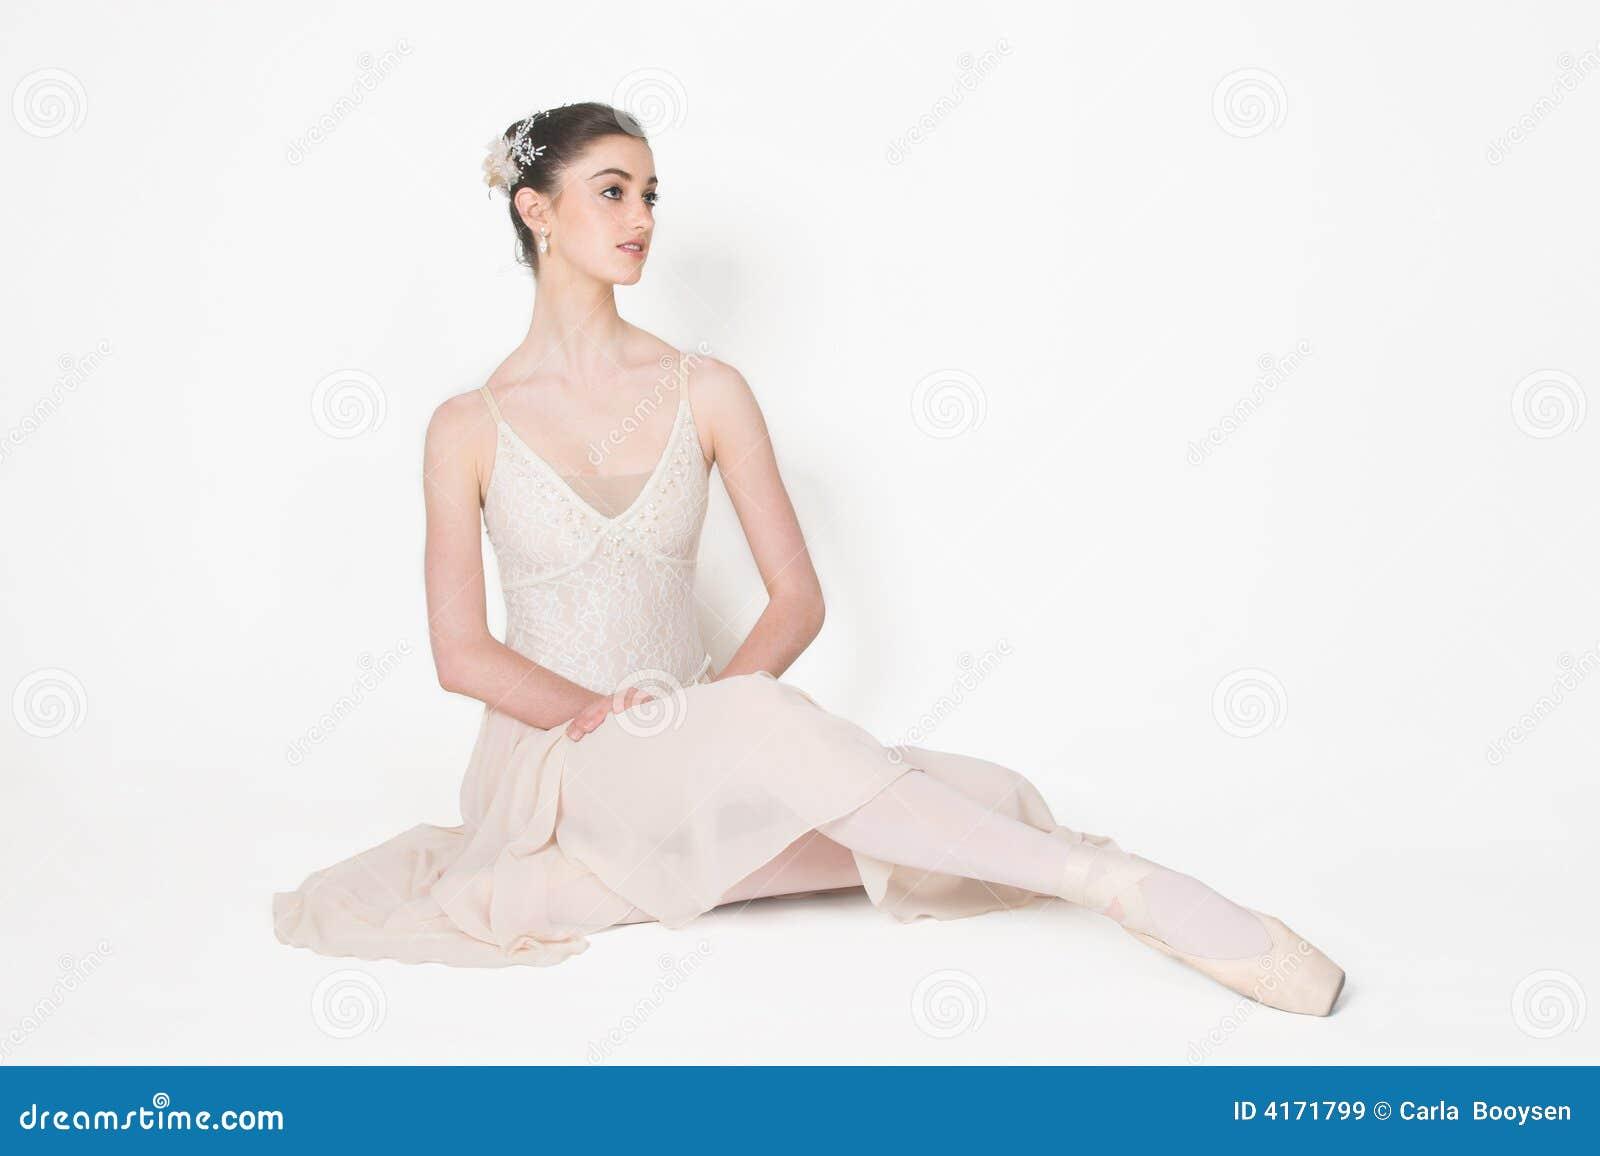 Ballerina Pose Royalty Free Stock Images - Image: 4171799